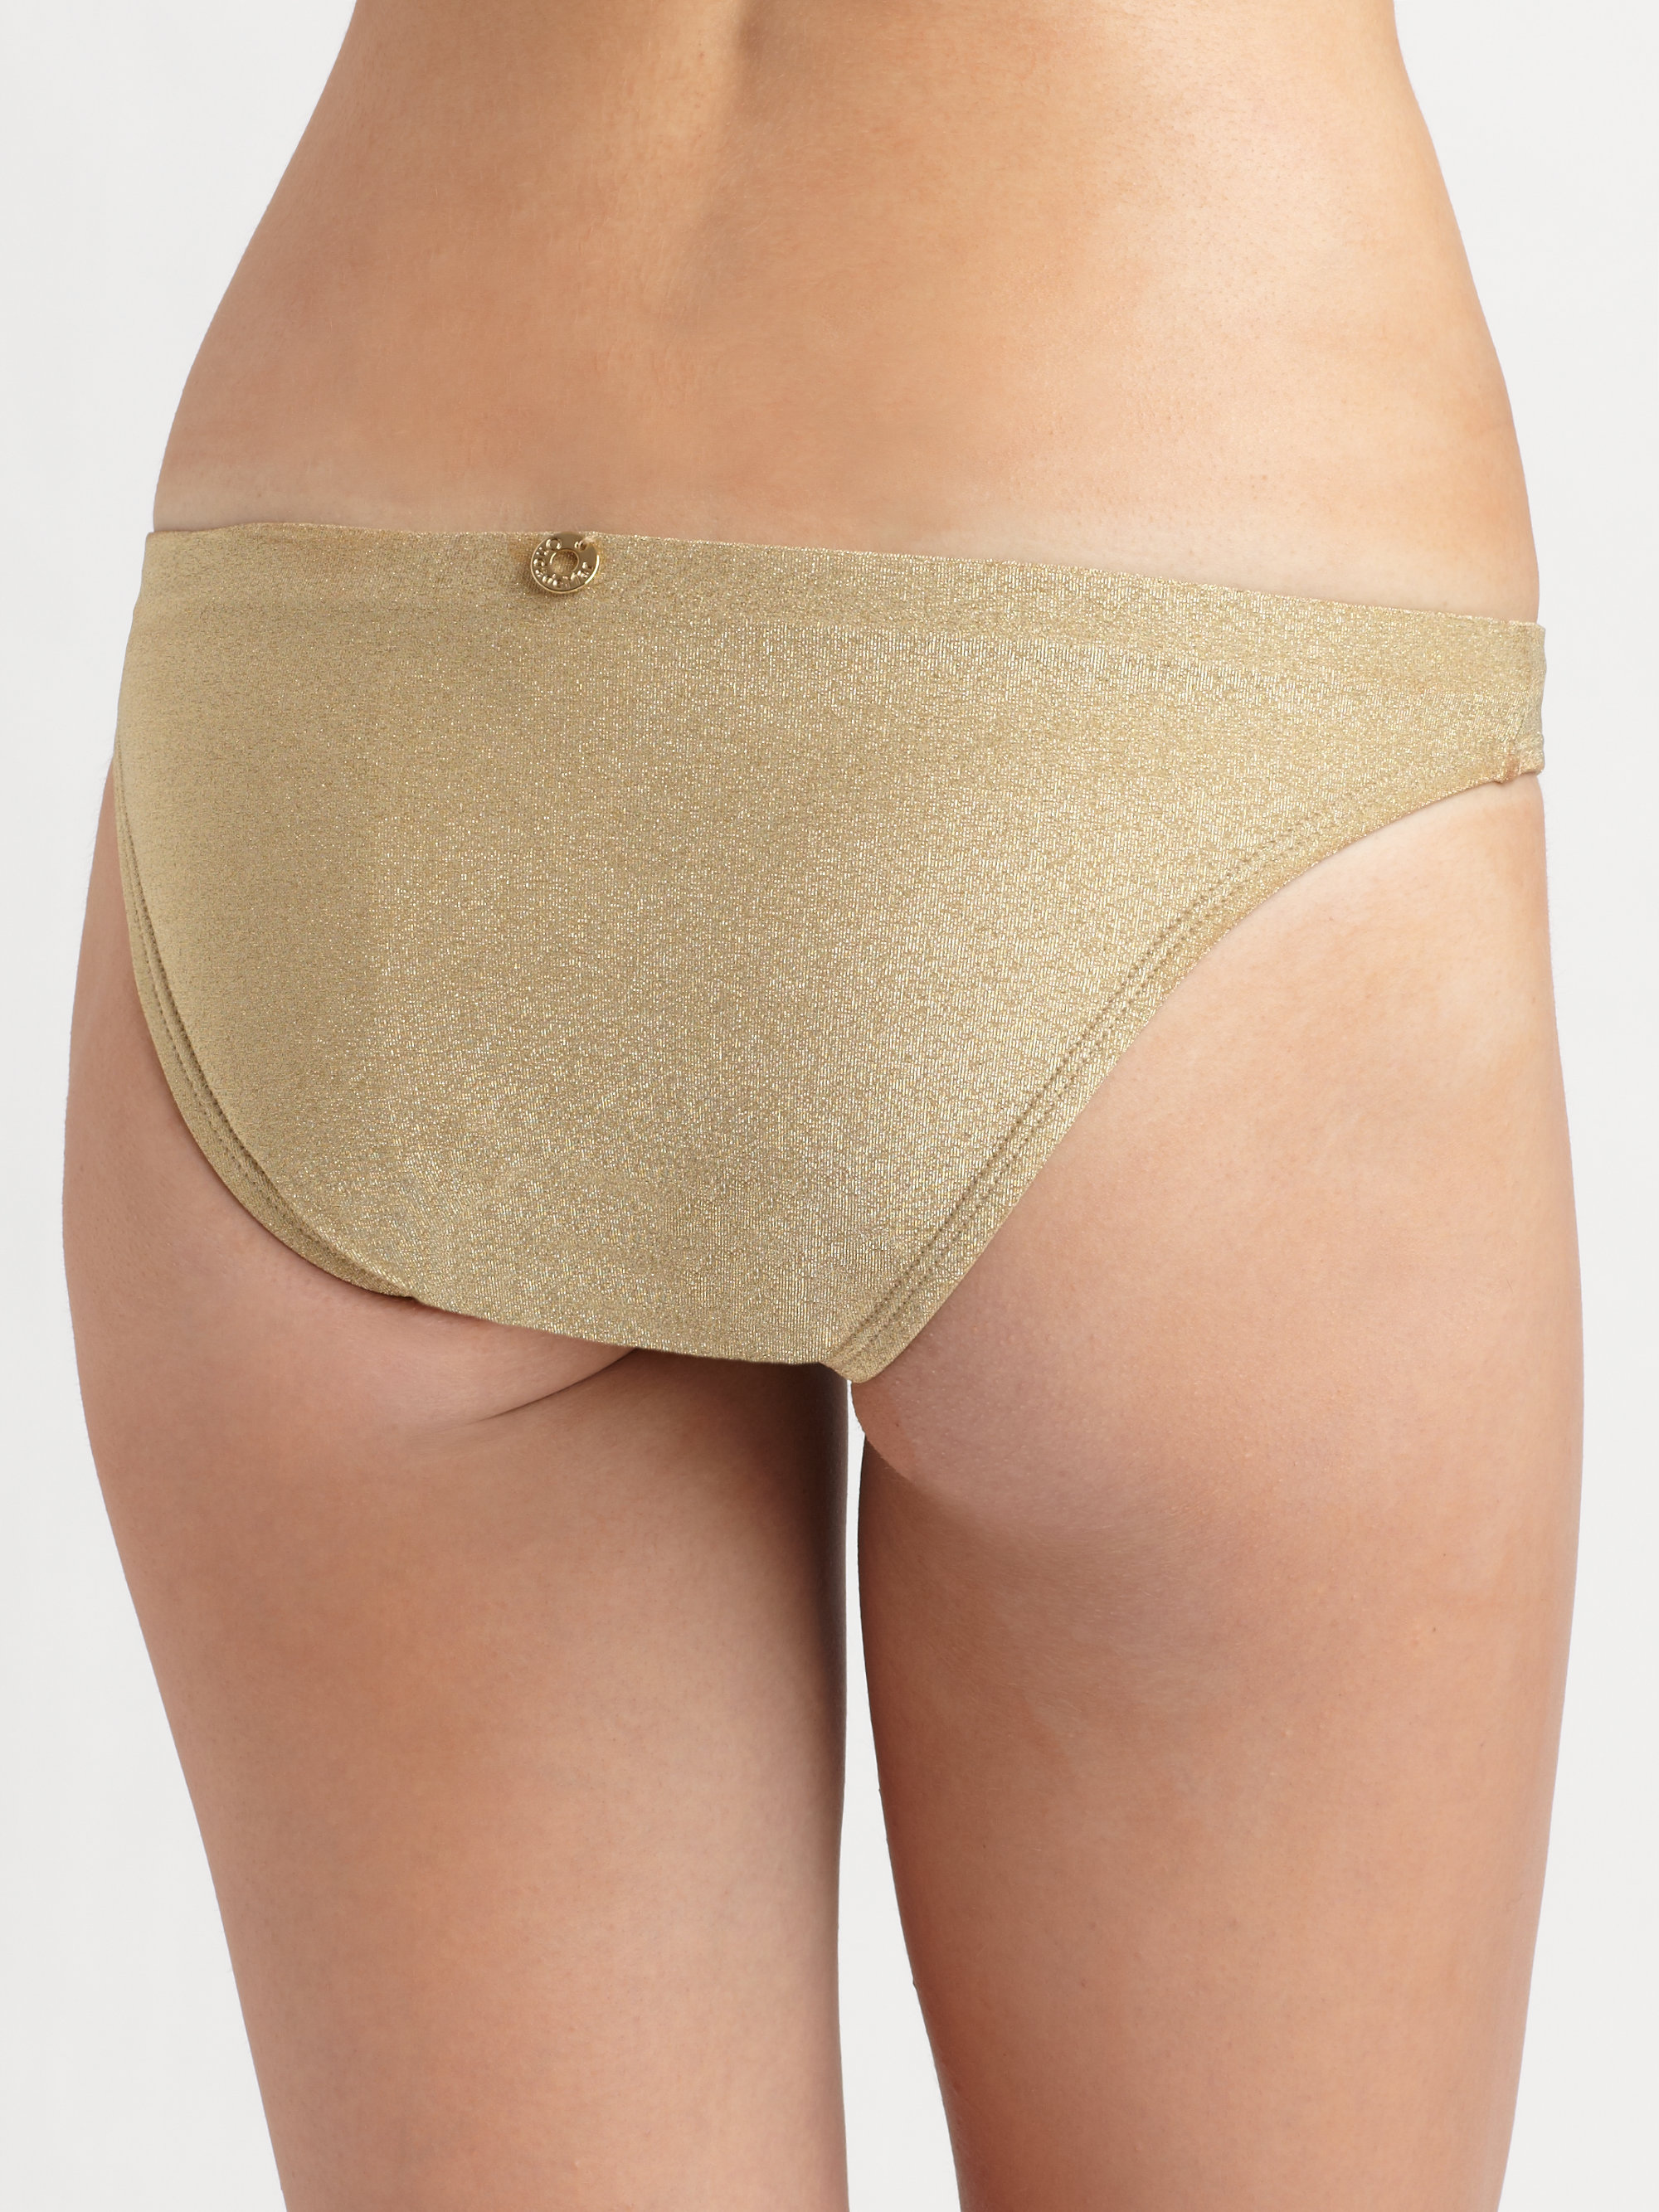 nude girls showing panties